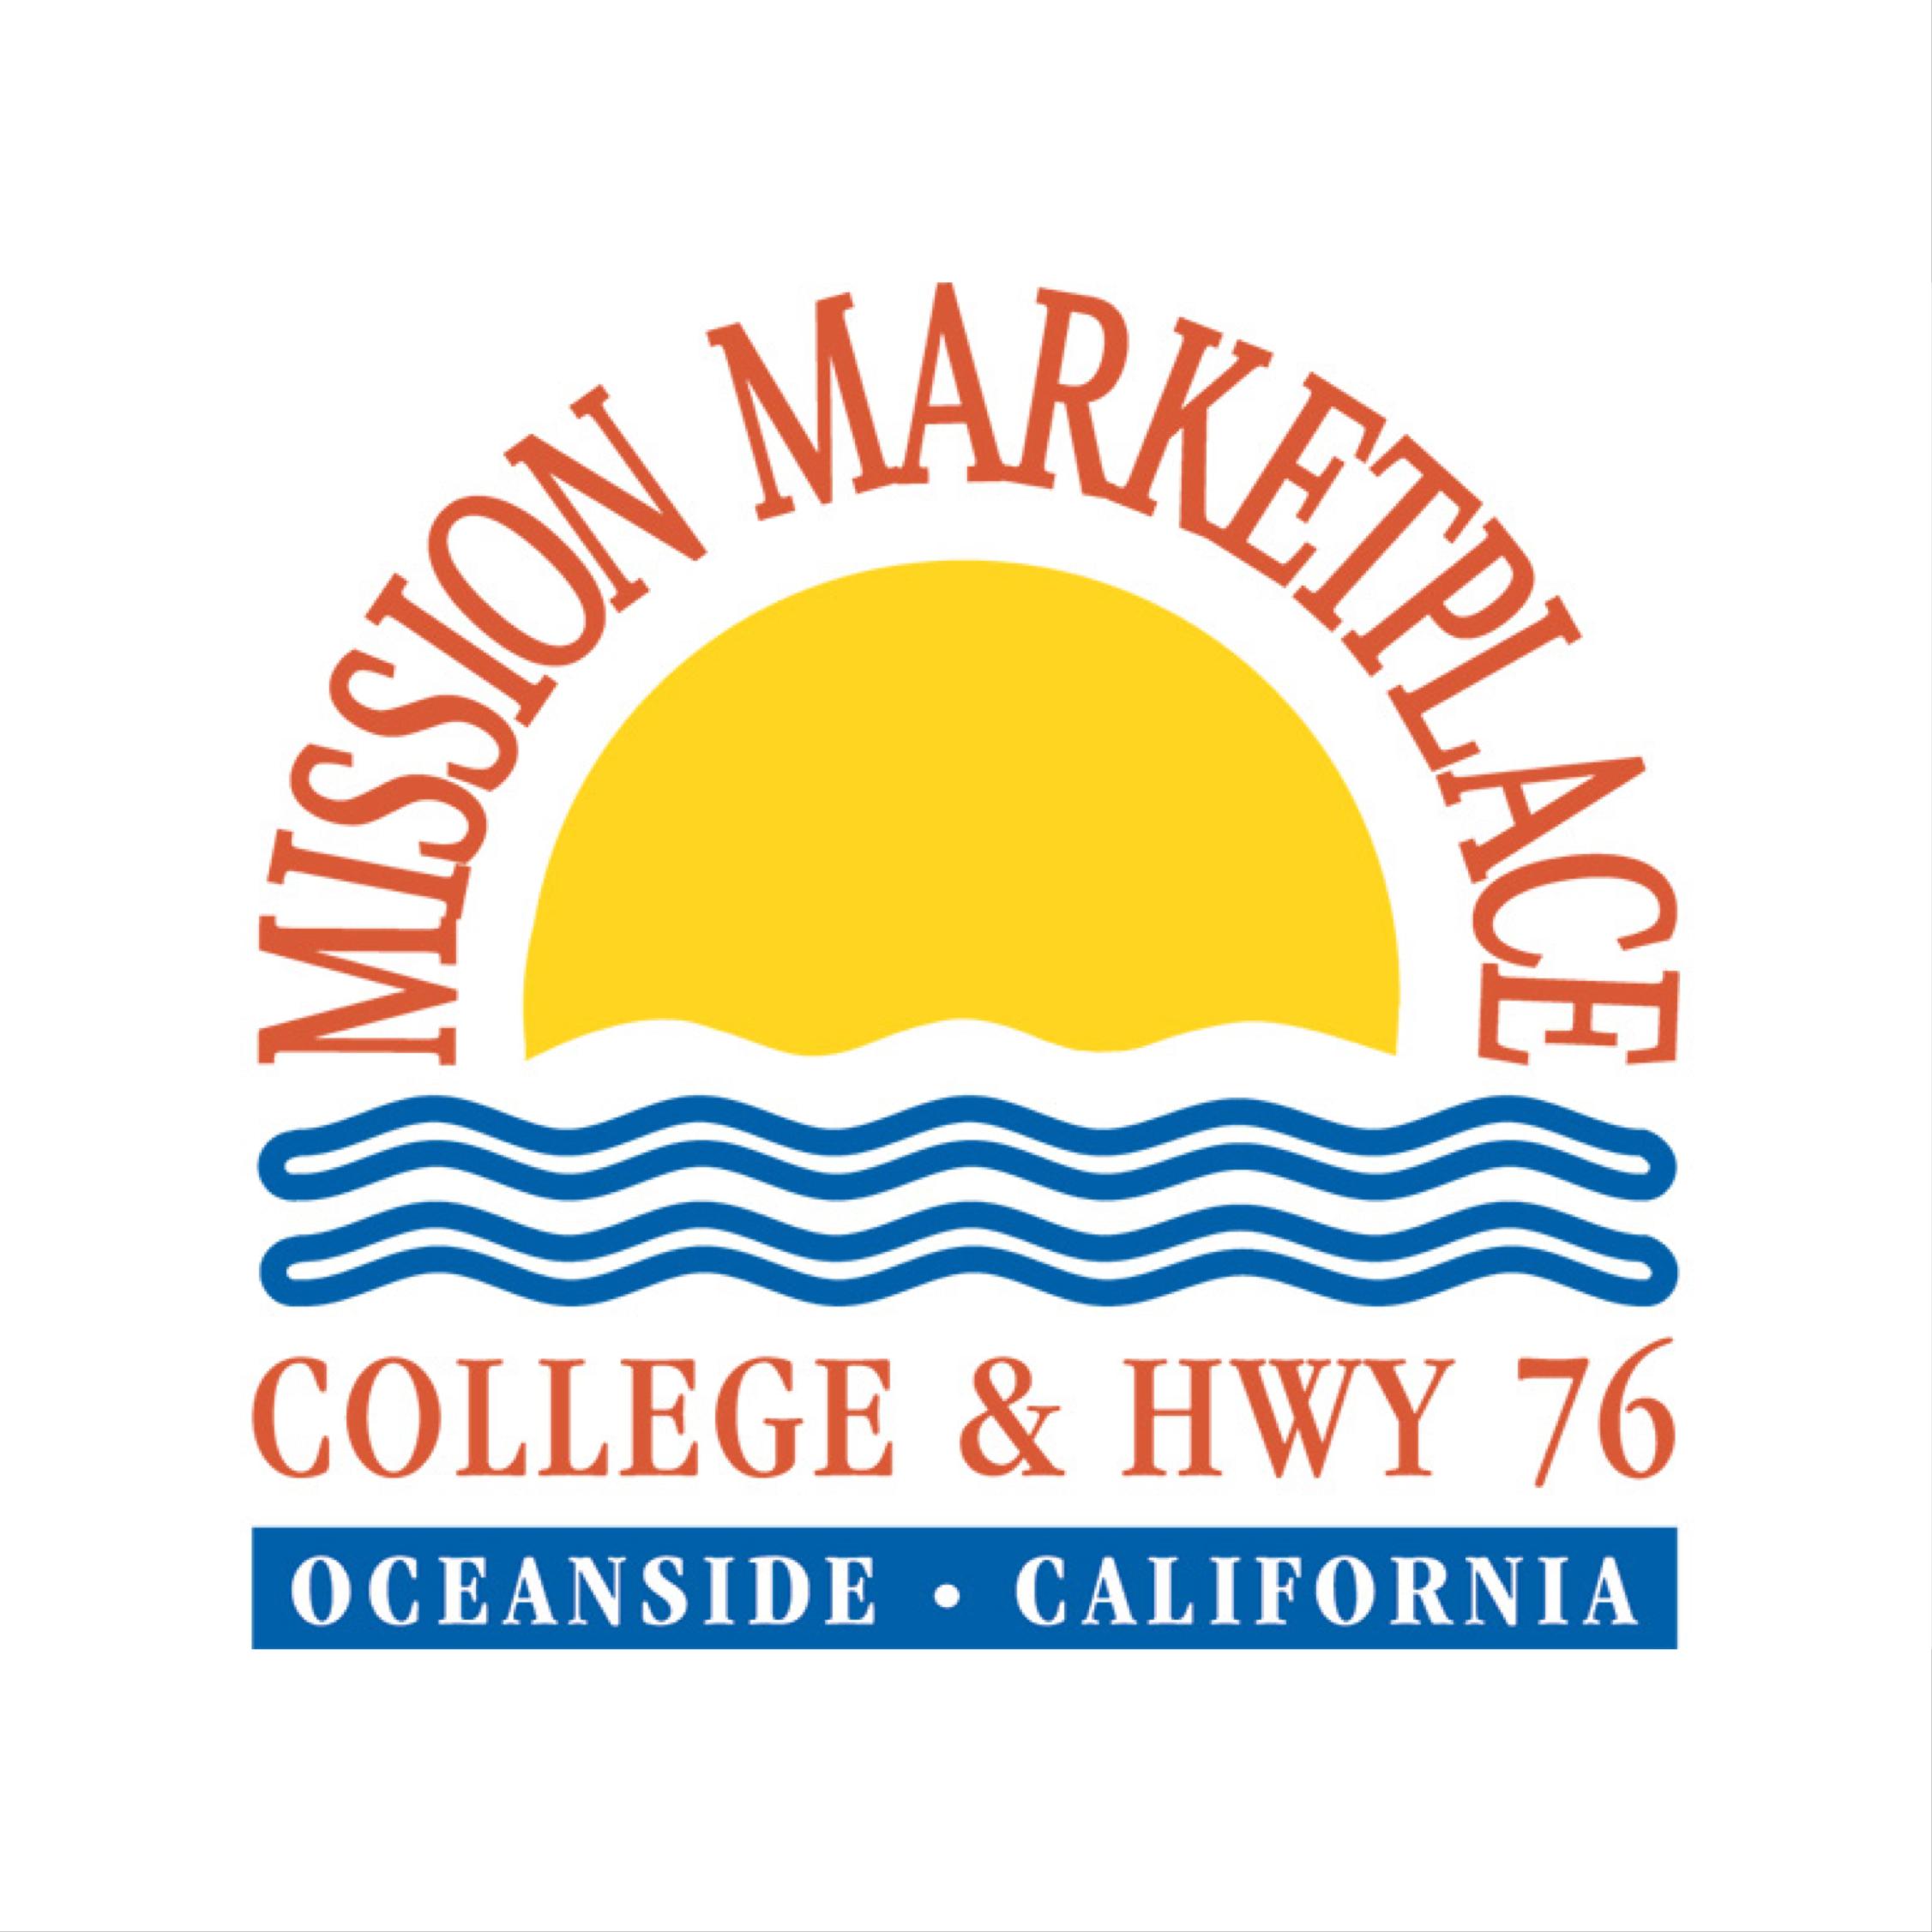 Mission-Market